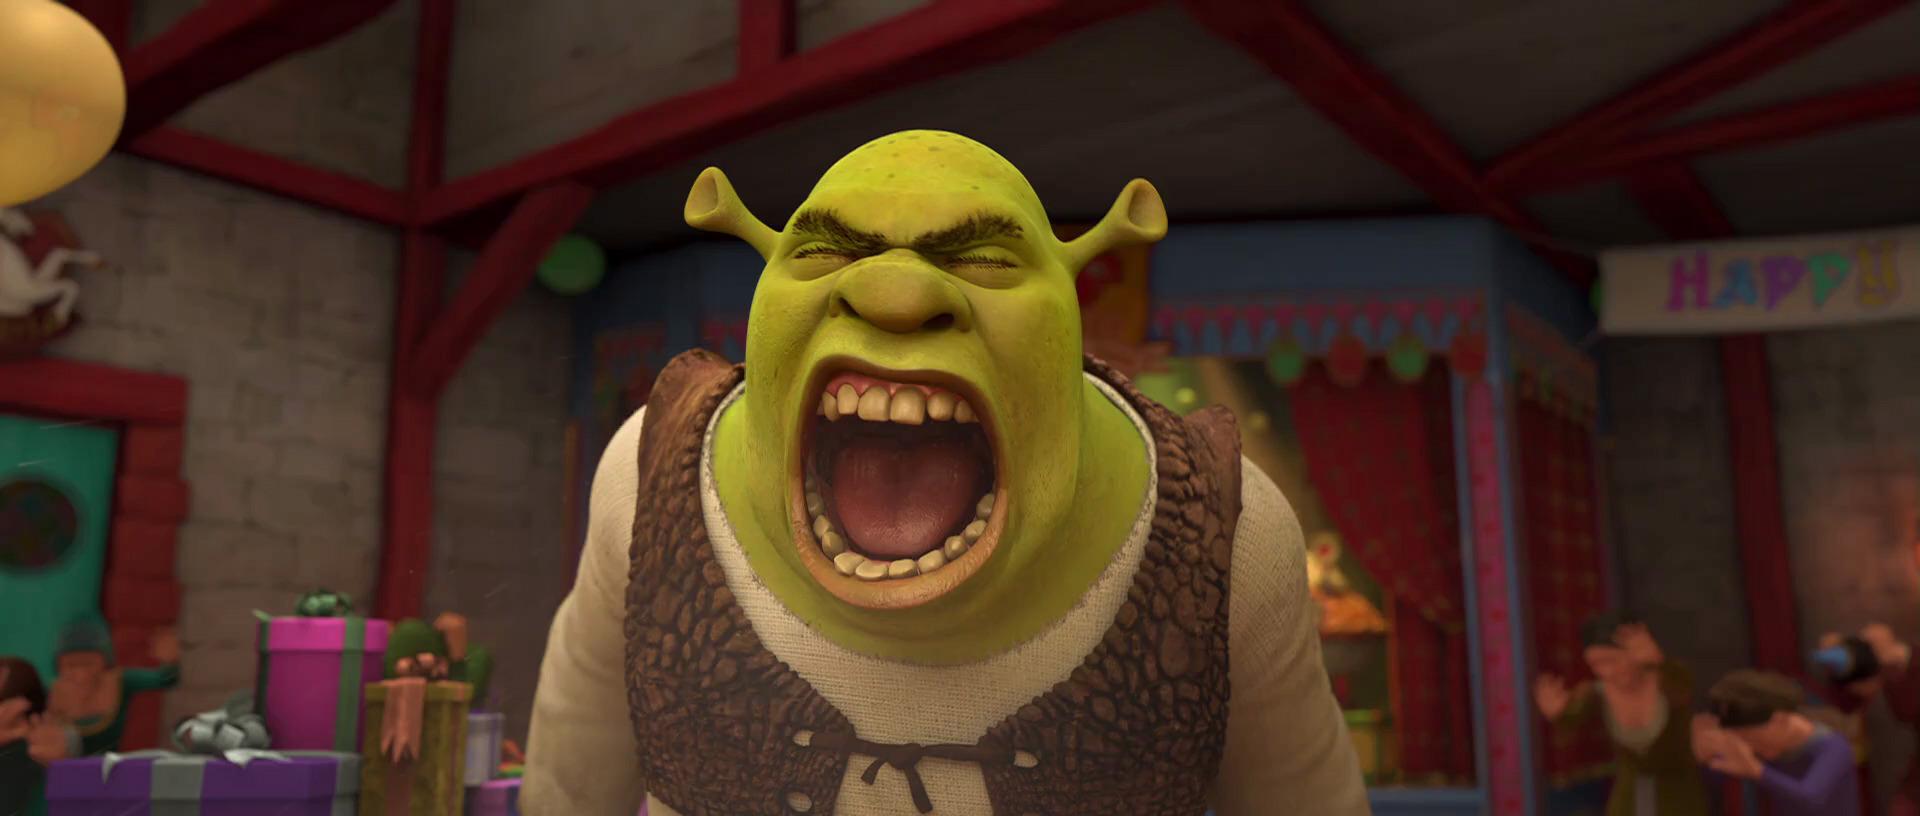 Shrek4-disneyscreencaps.com-1289.jpg